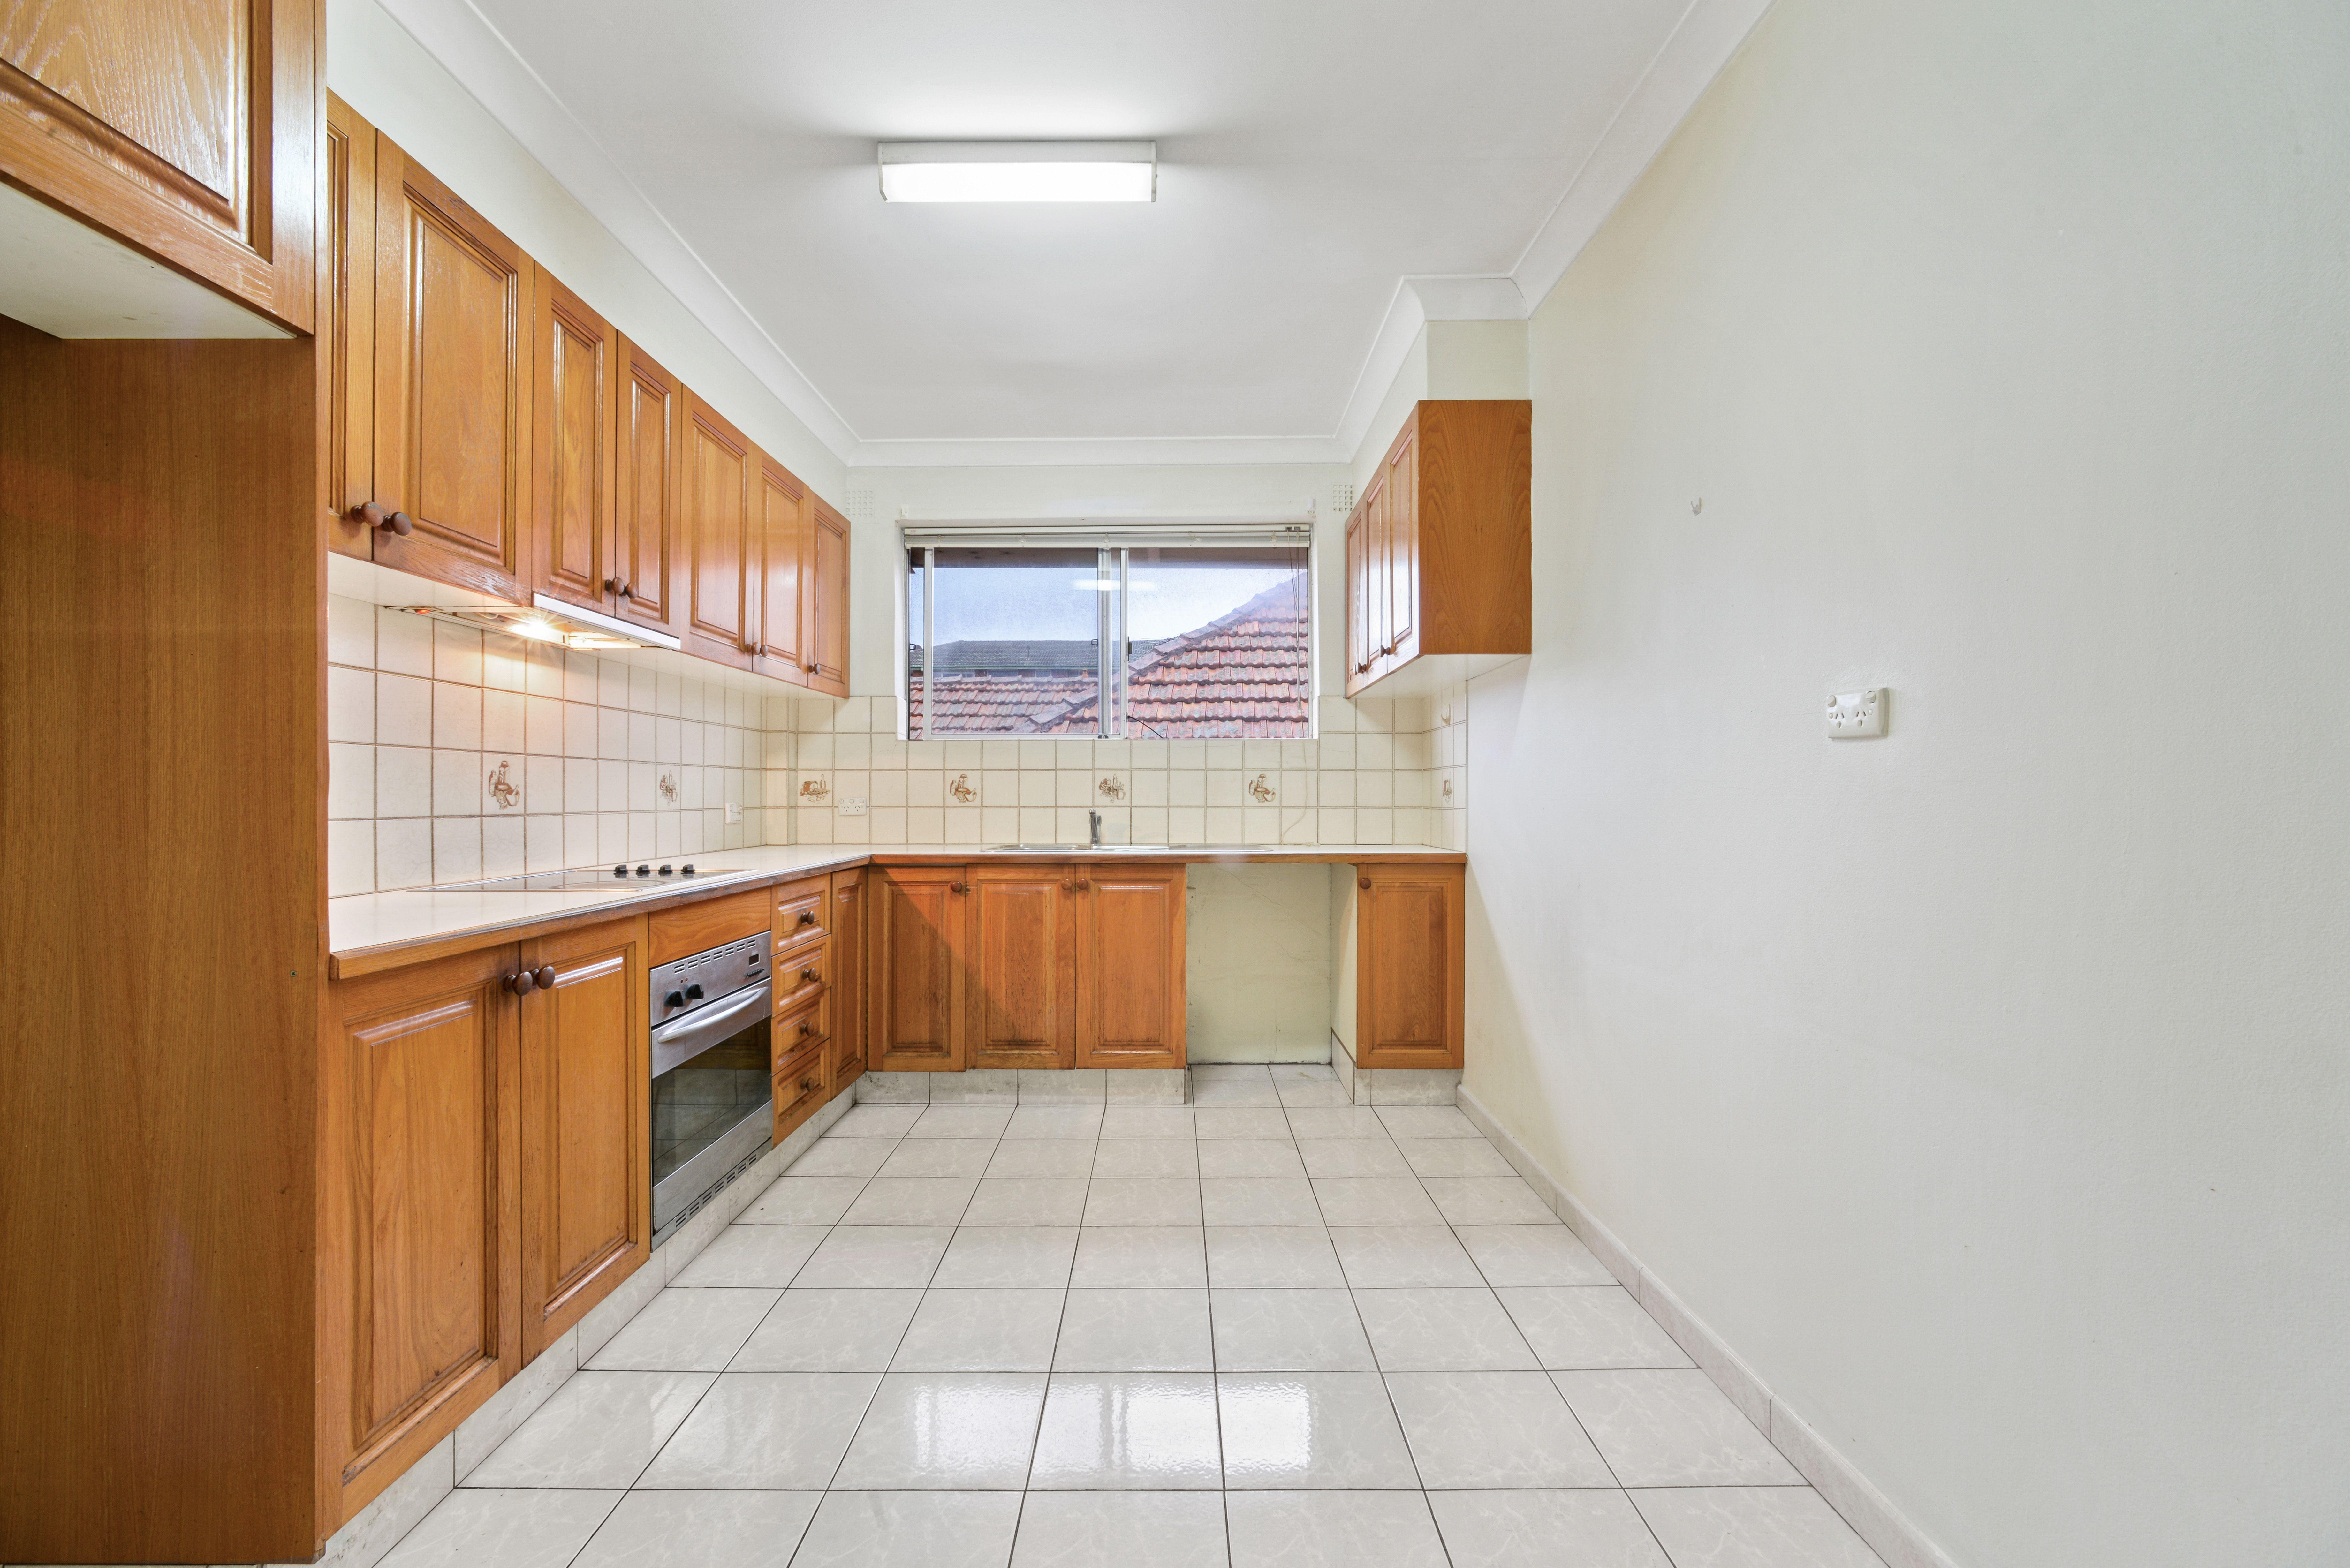 5/12 Evaline Street, Campsie NSW 2194